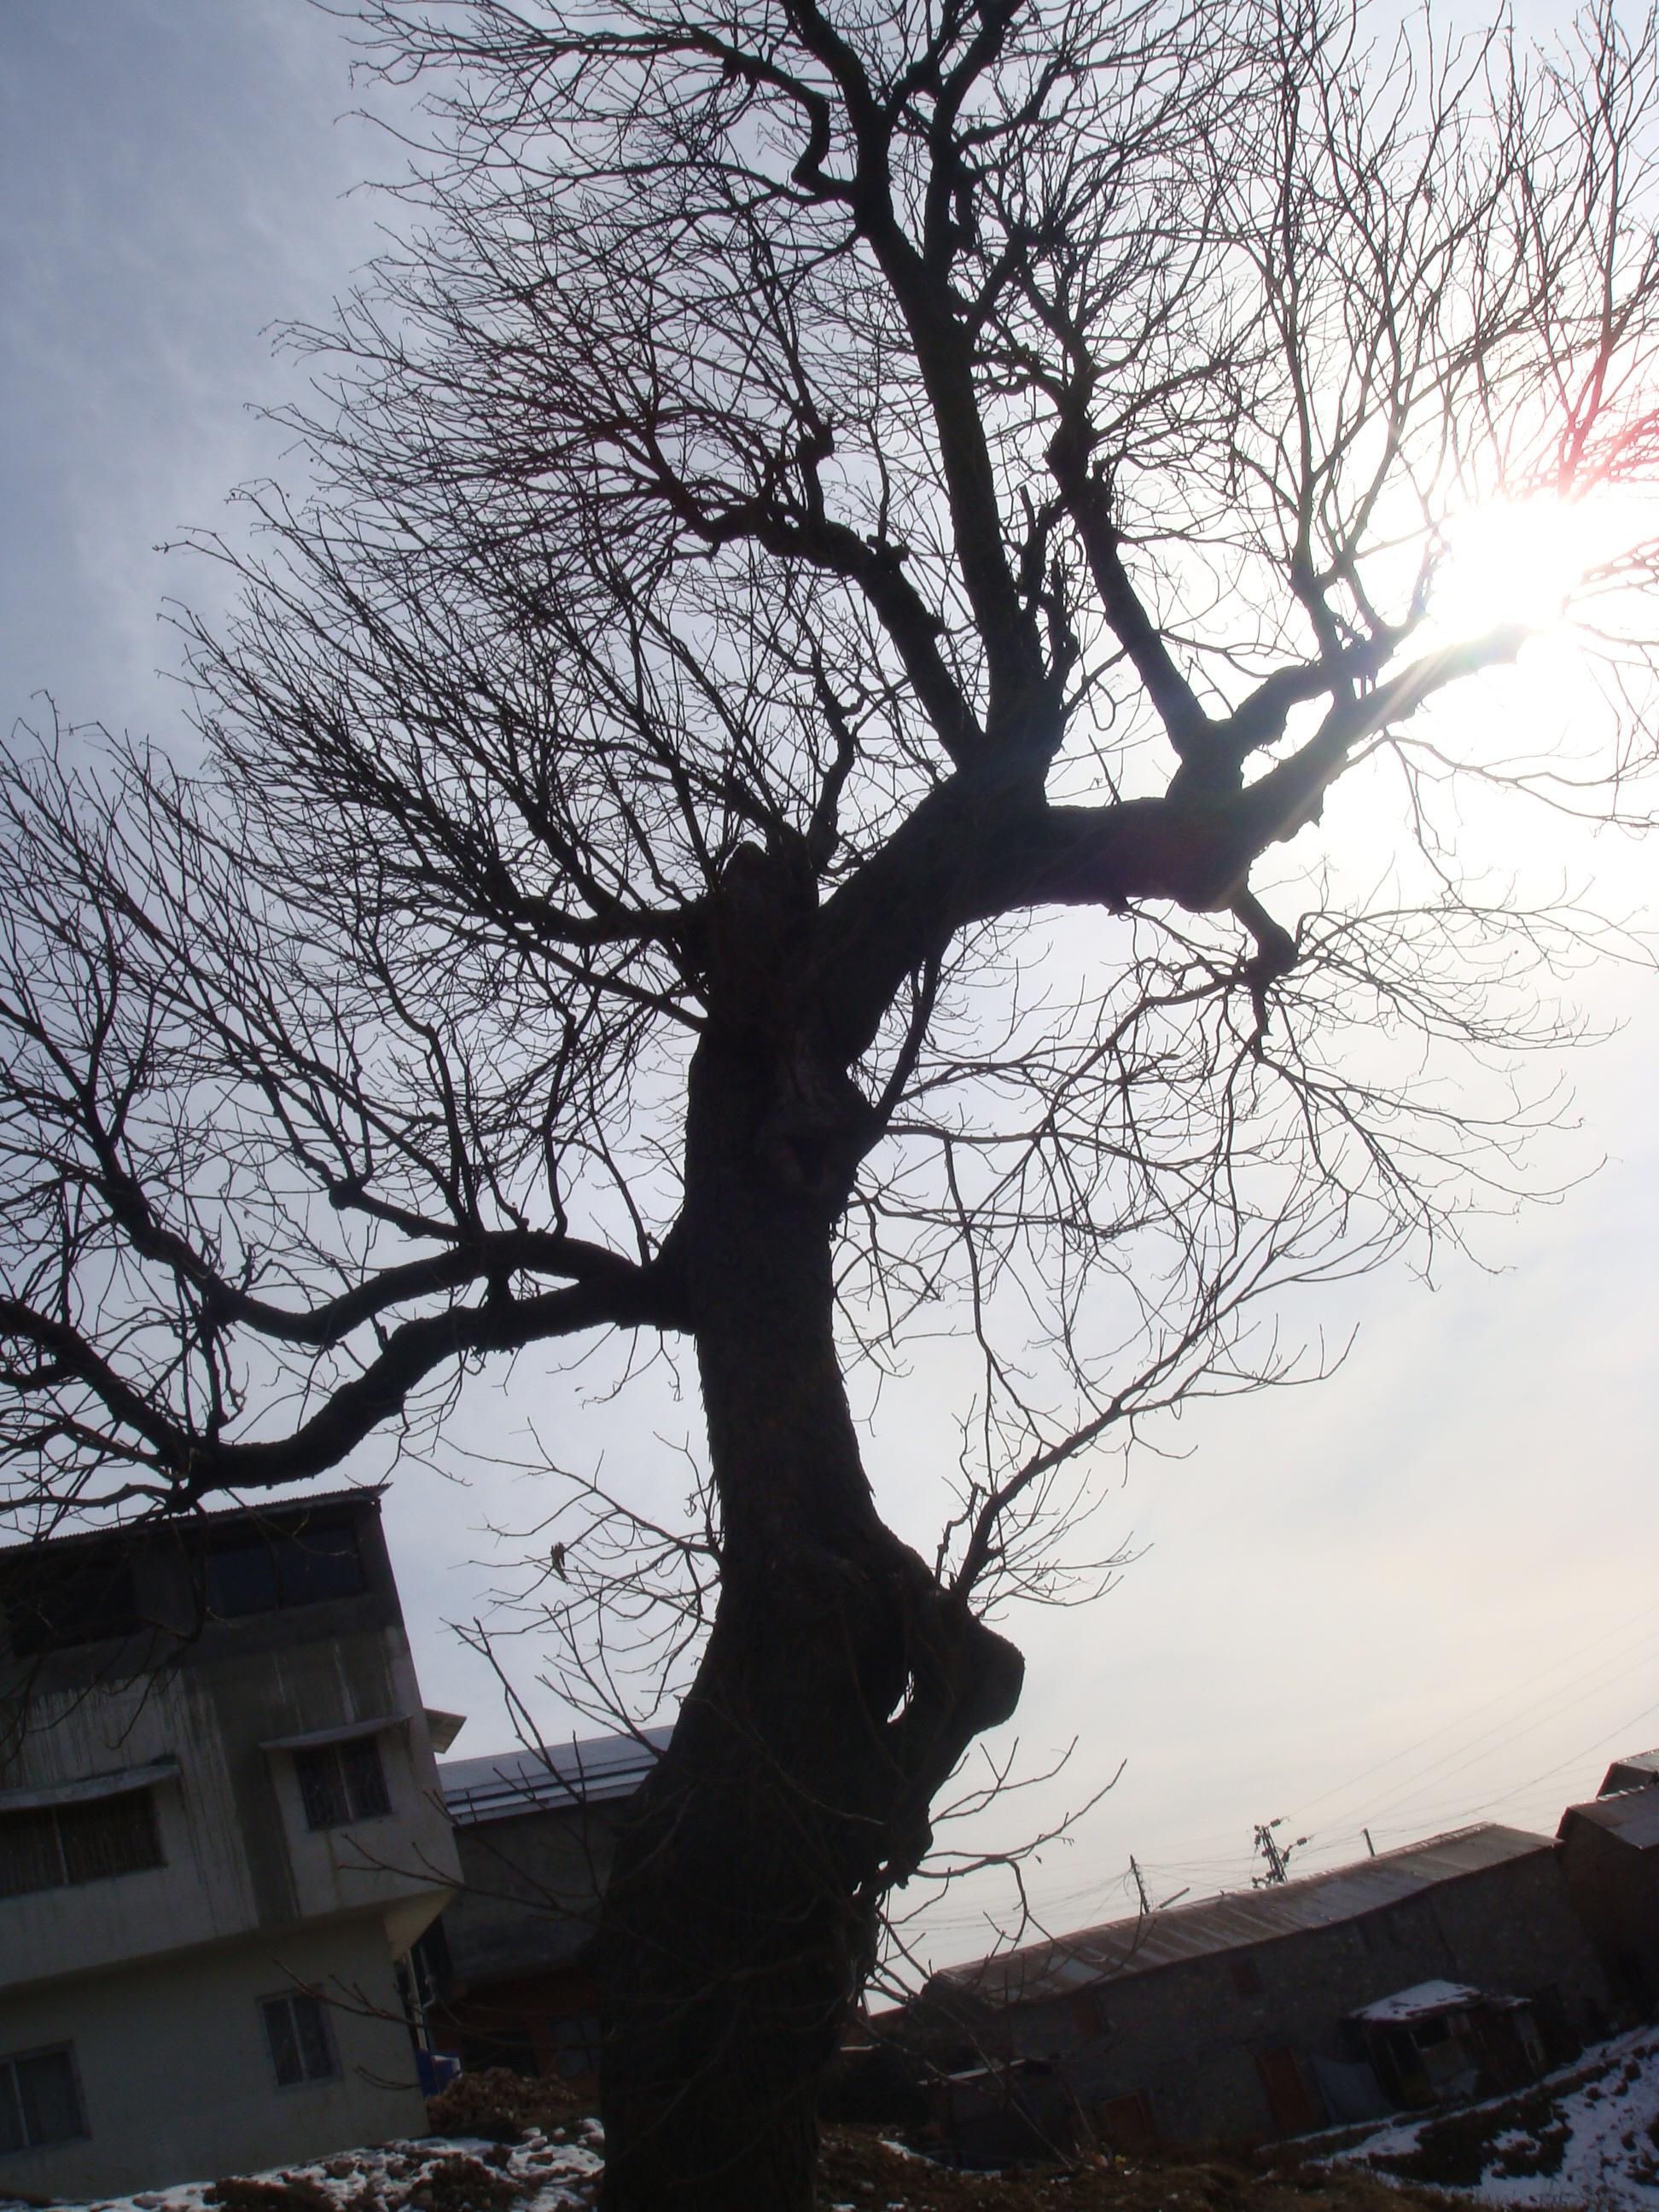 Tree, Branches, Dark, Evening, Jungle, HQ Photo